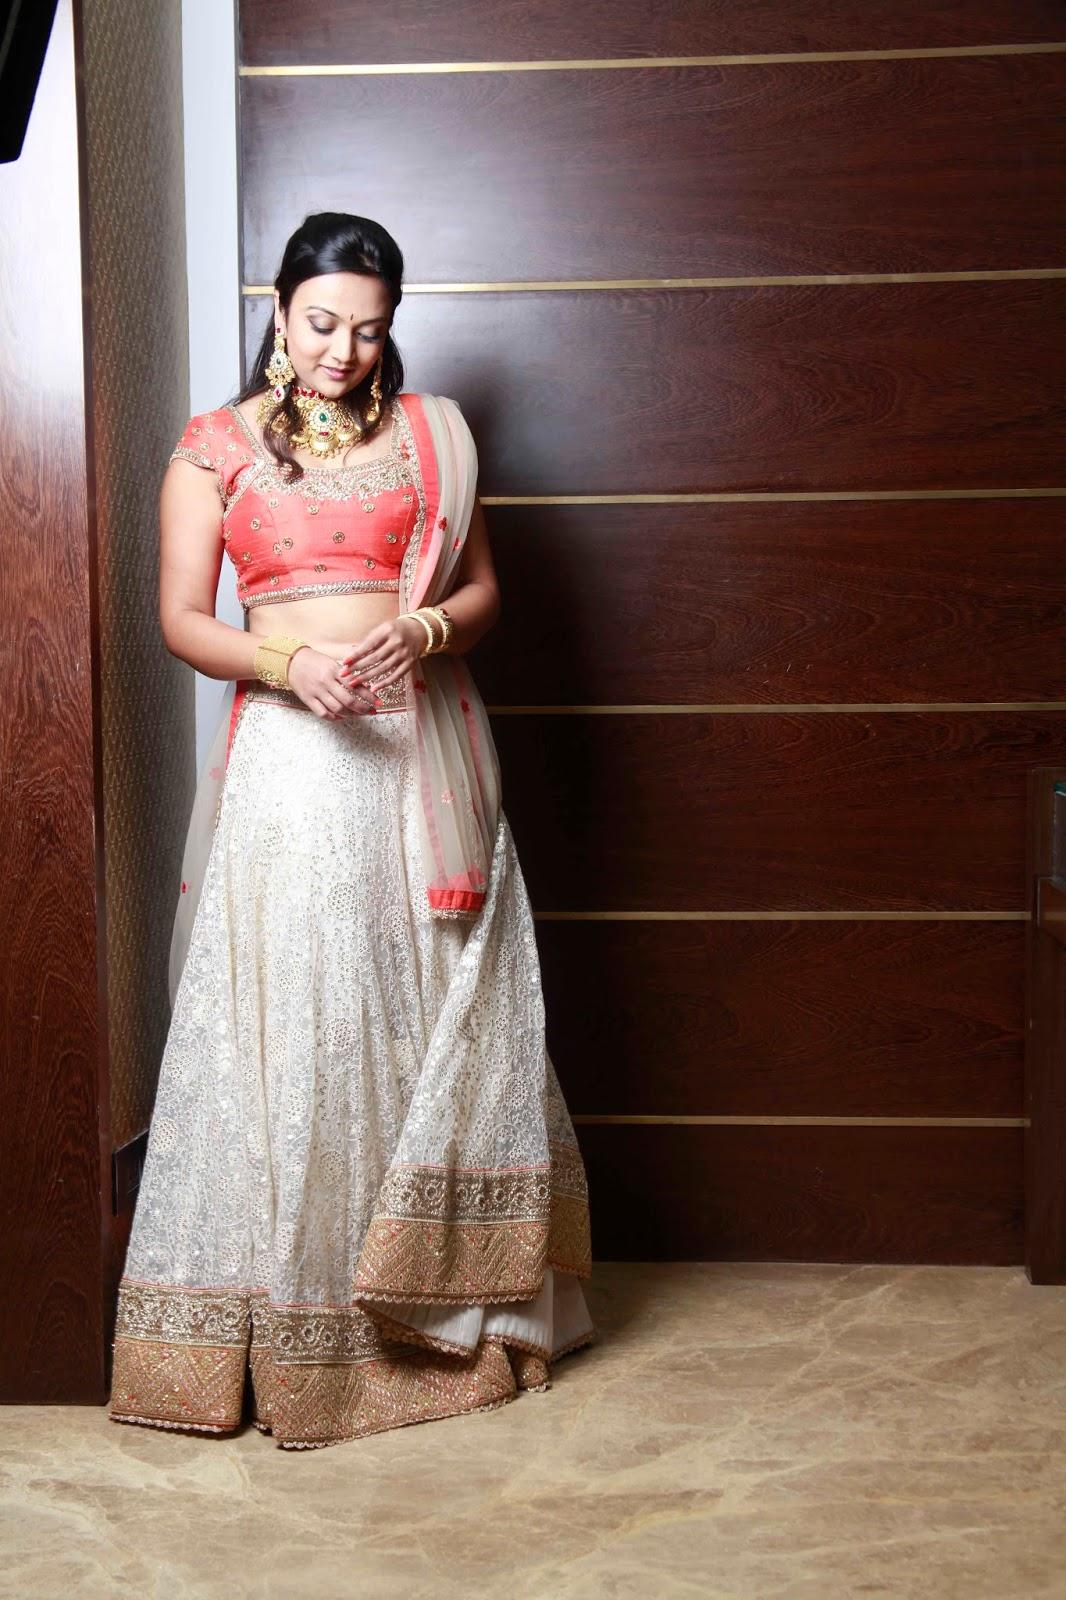 bridal gold jewelry, bridal lehenga, designer lehengas online, indian bride, anisha sheetys couture, bollywood celebrity designer, designer wear online